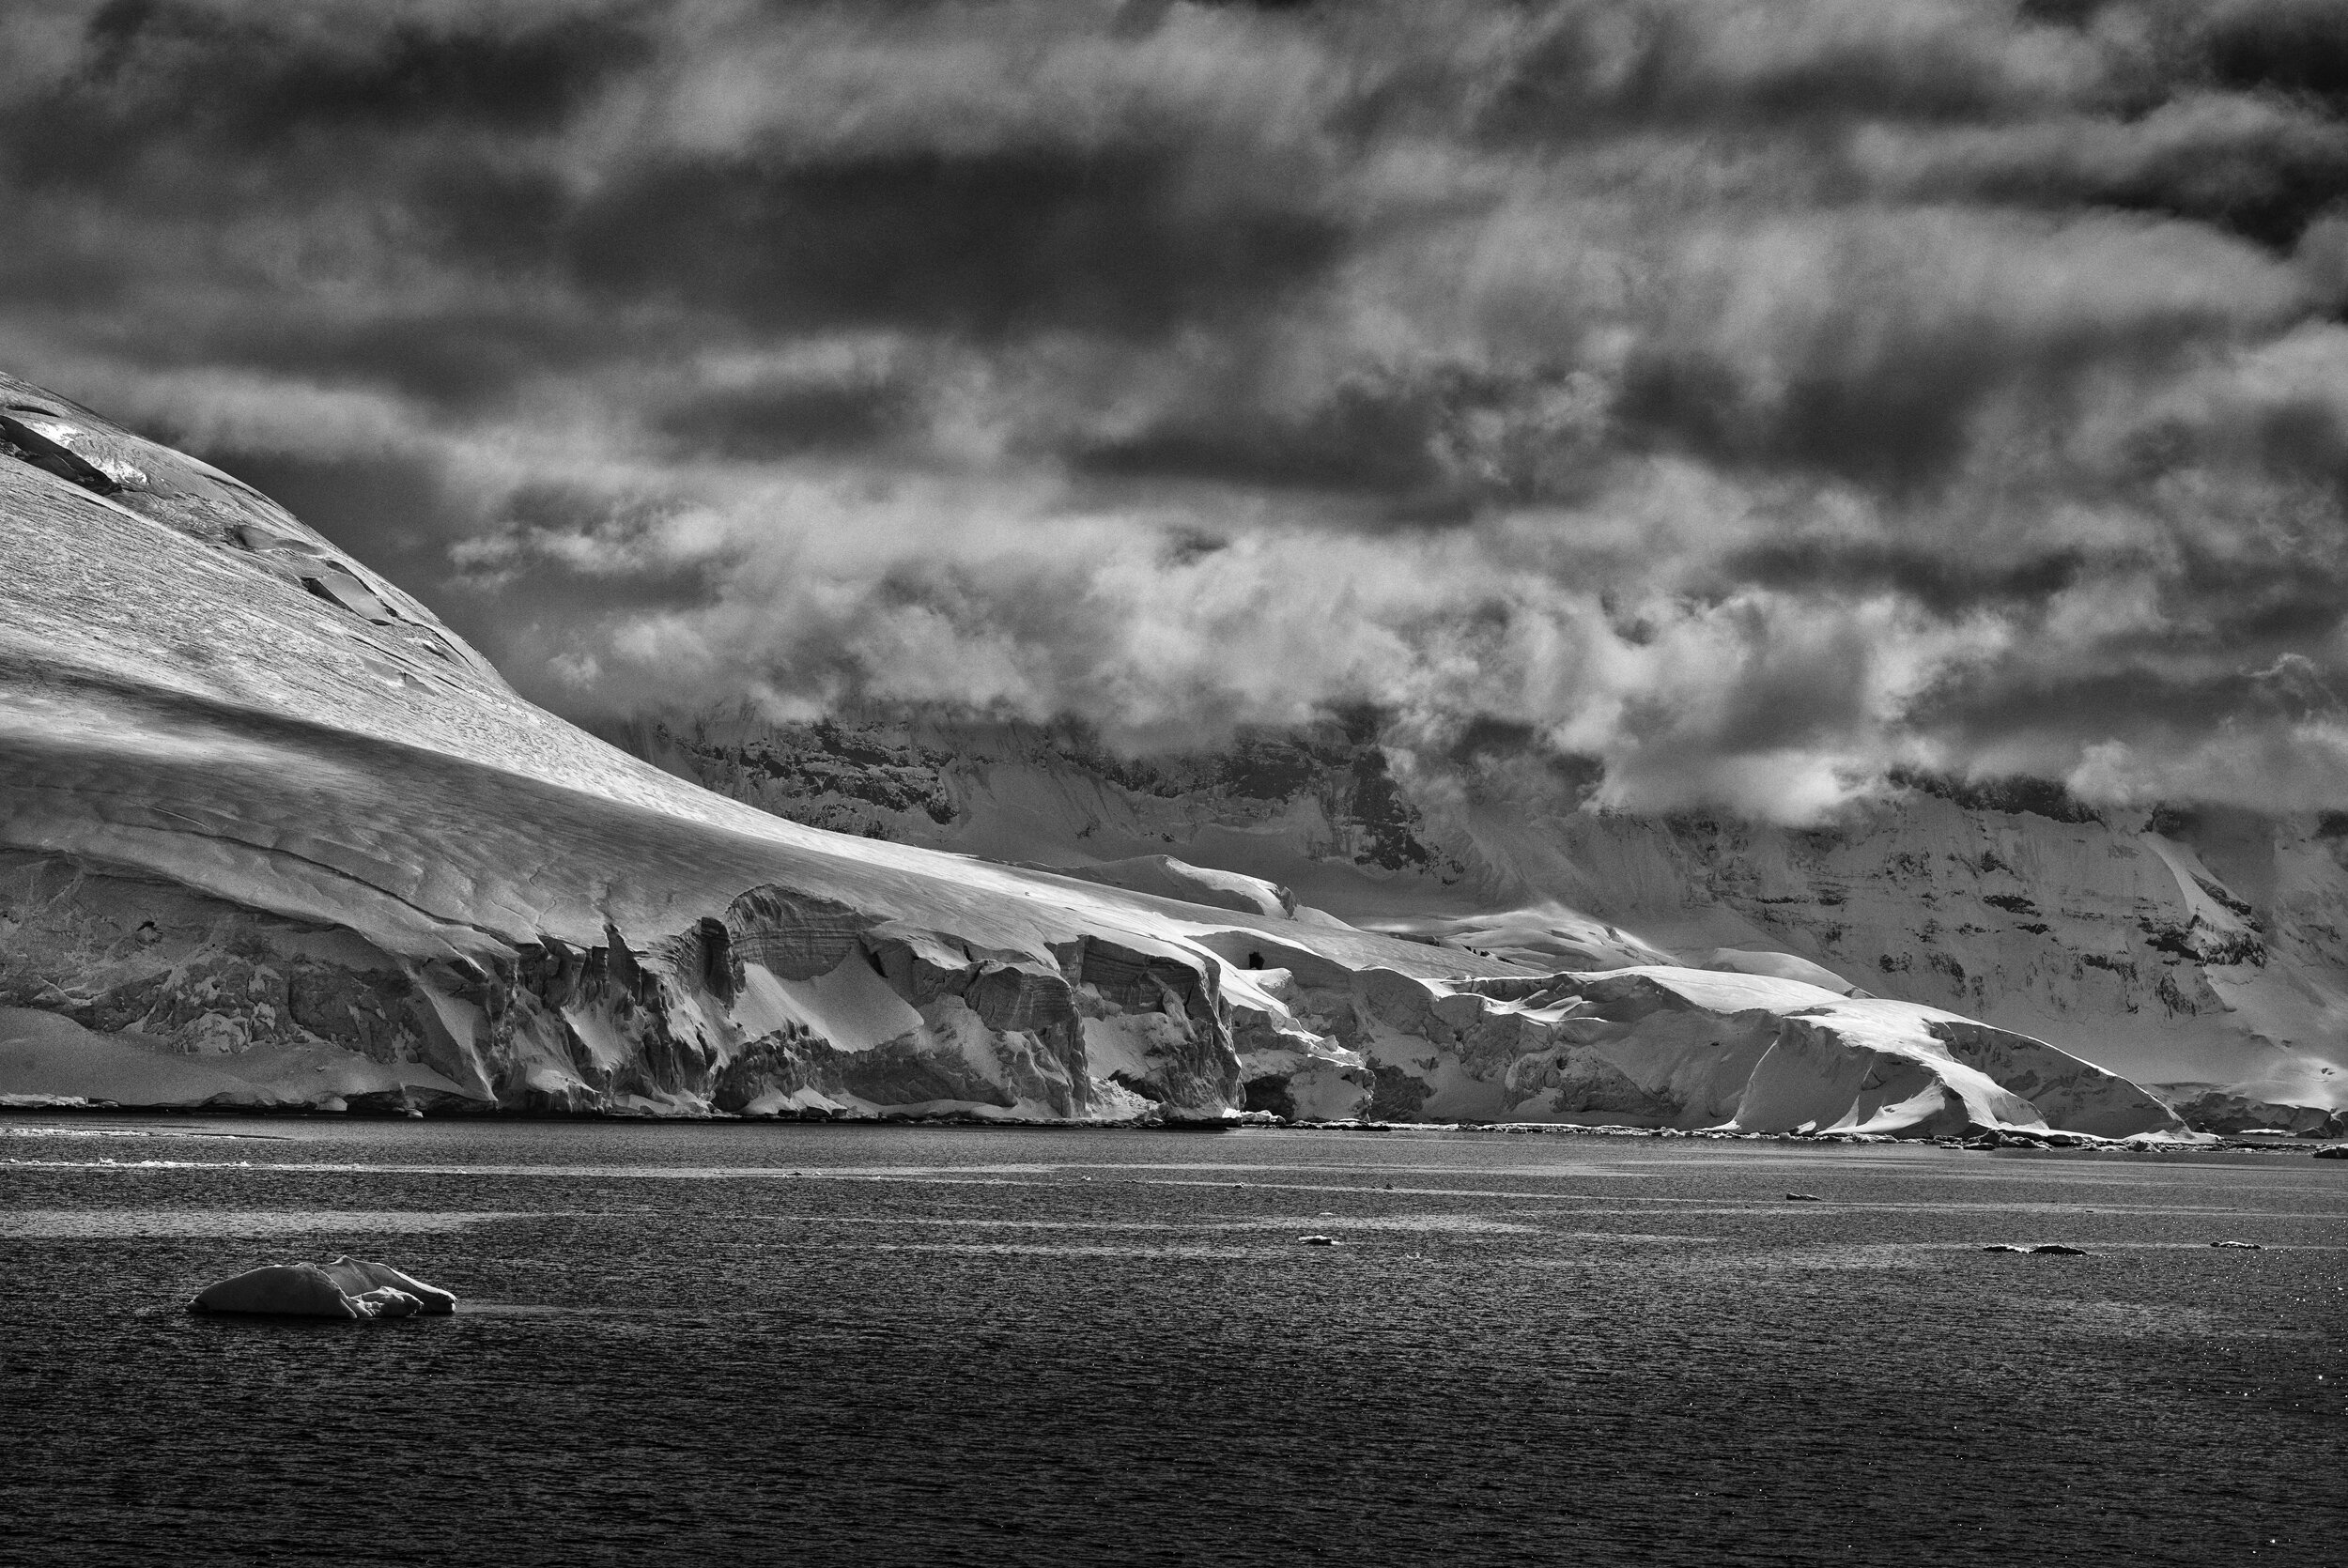 manuel_uebler_antarctica_bw_009.jpg